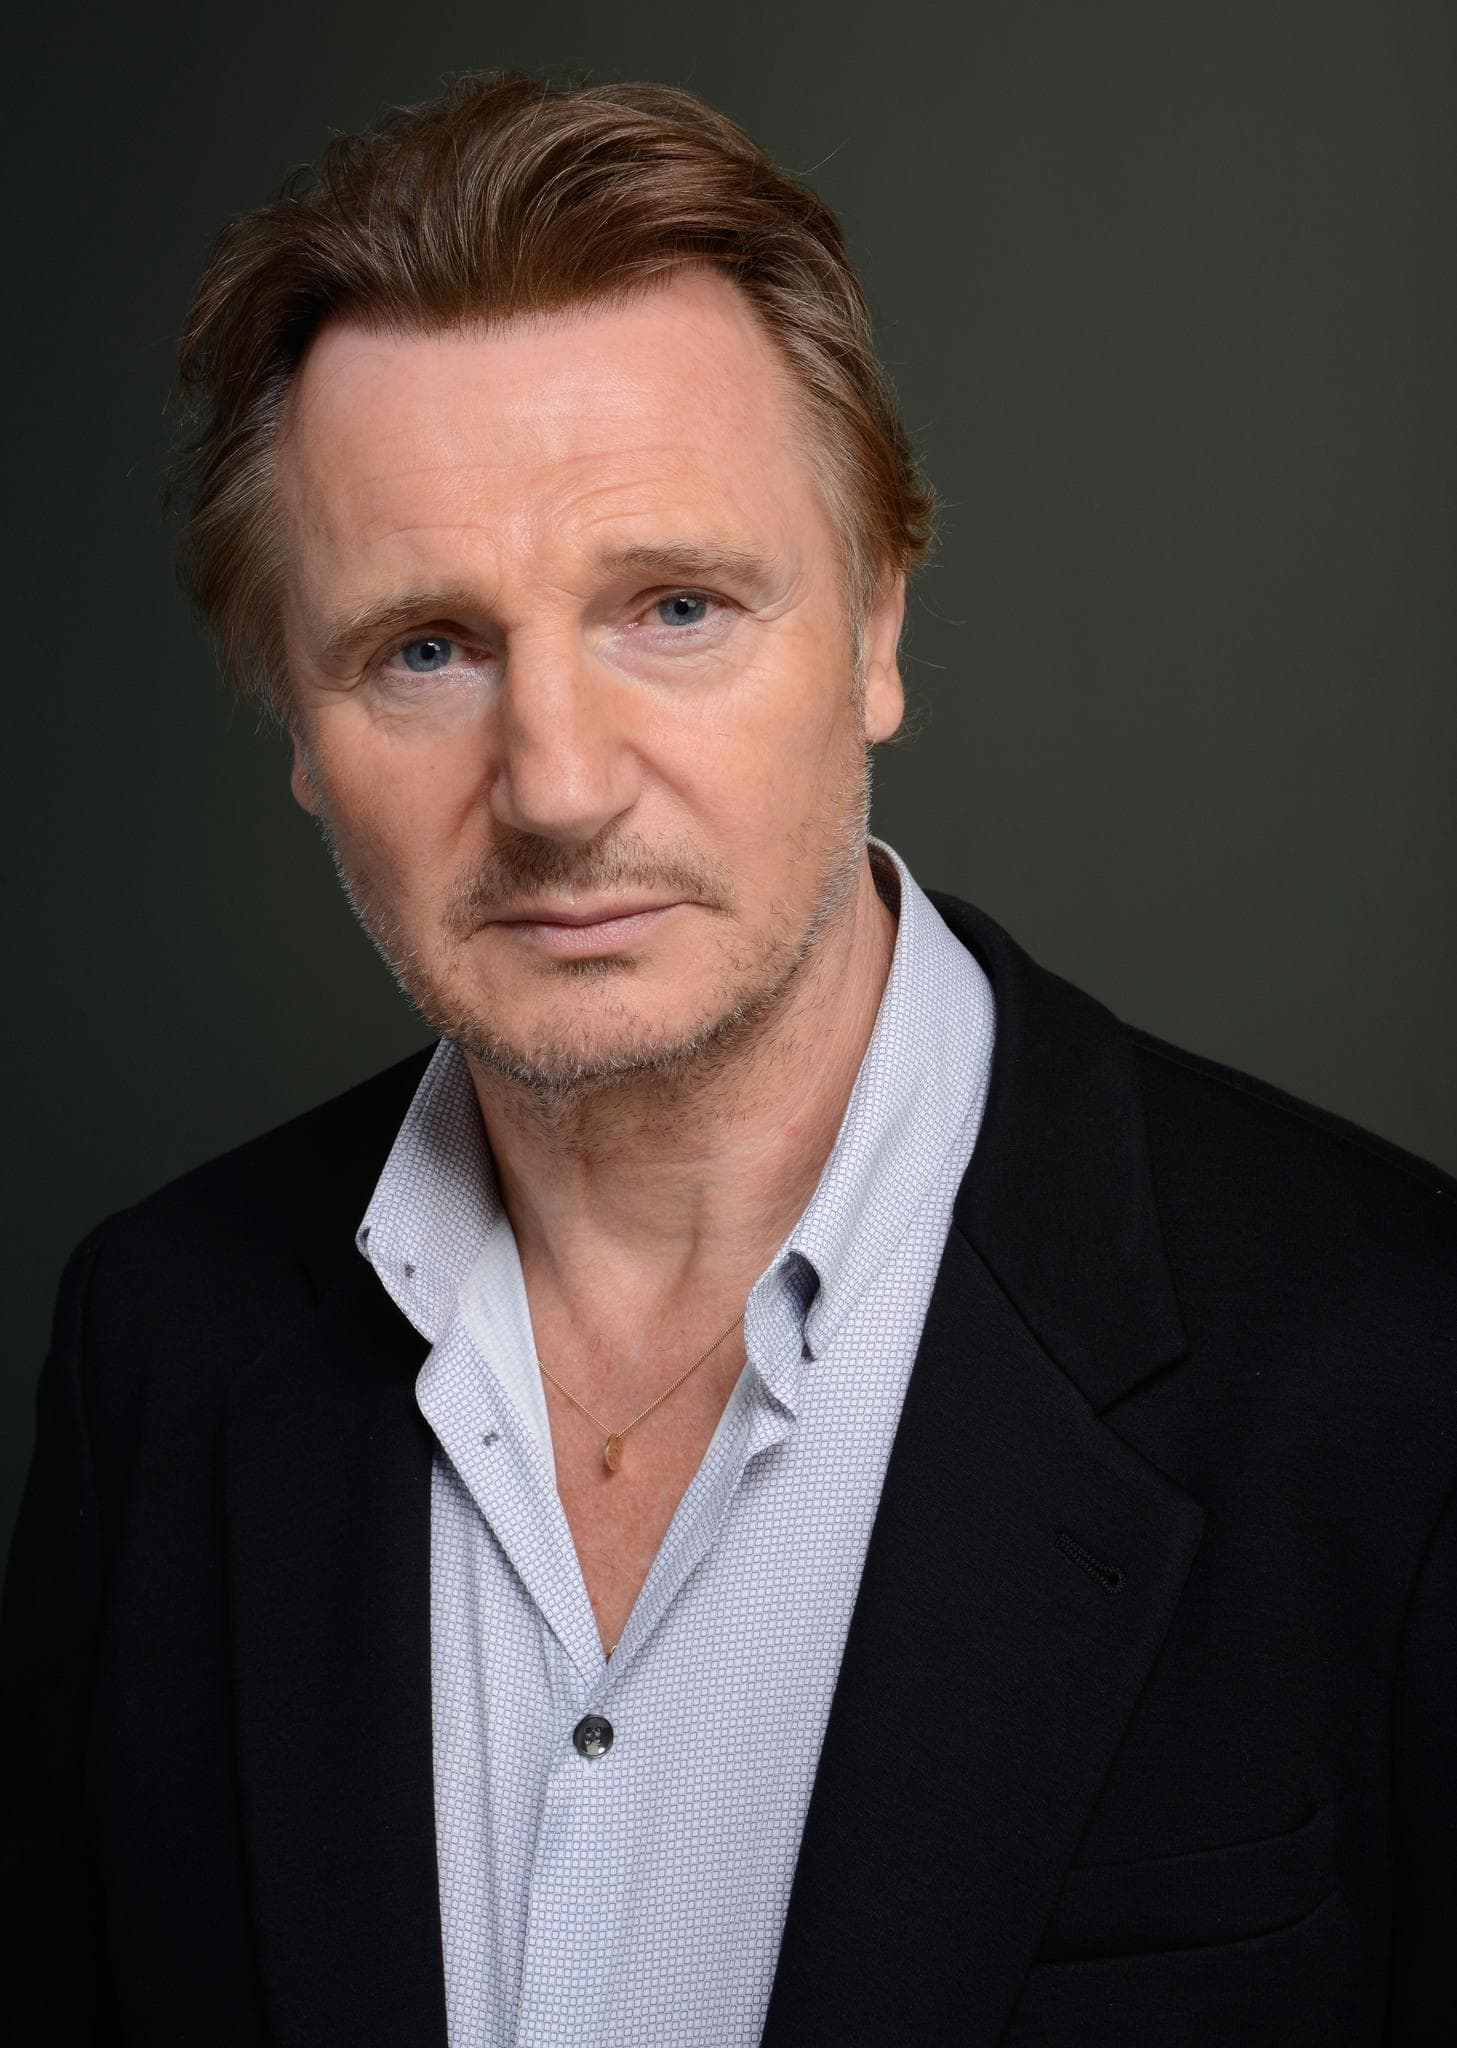 Liam Neeson For mobile